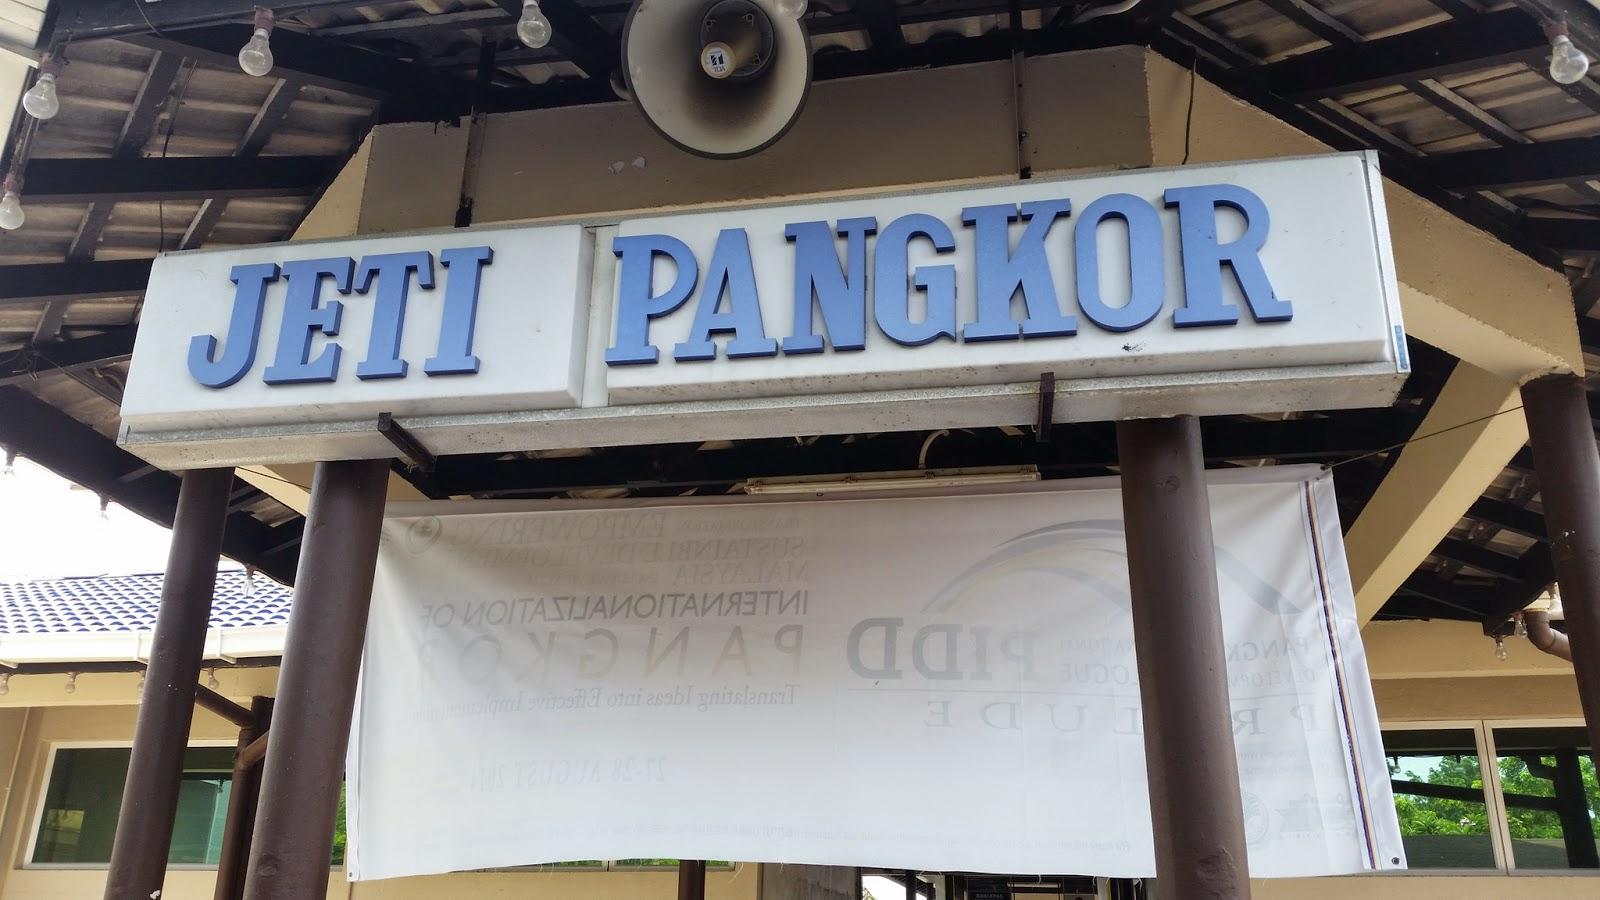 Jeti Pangkor